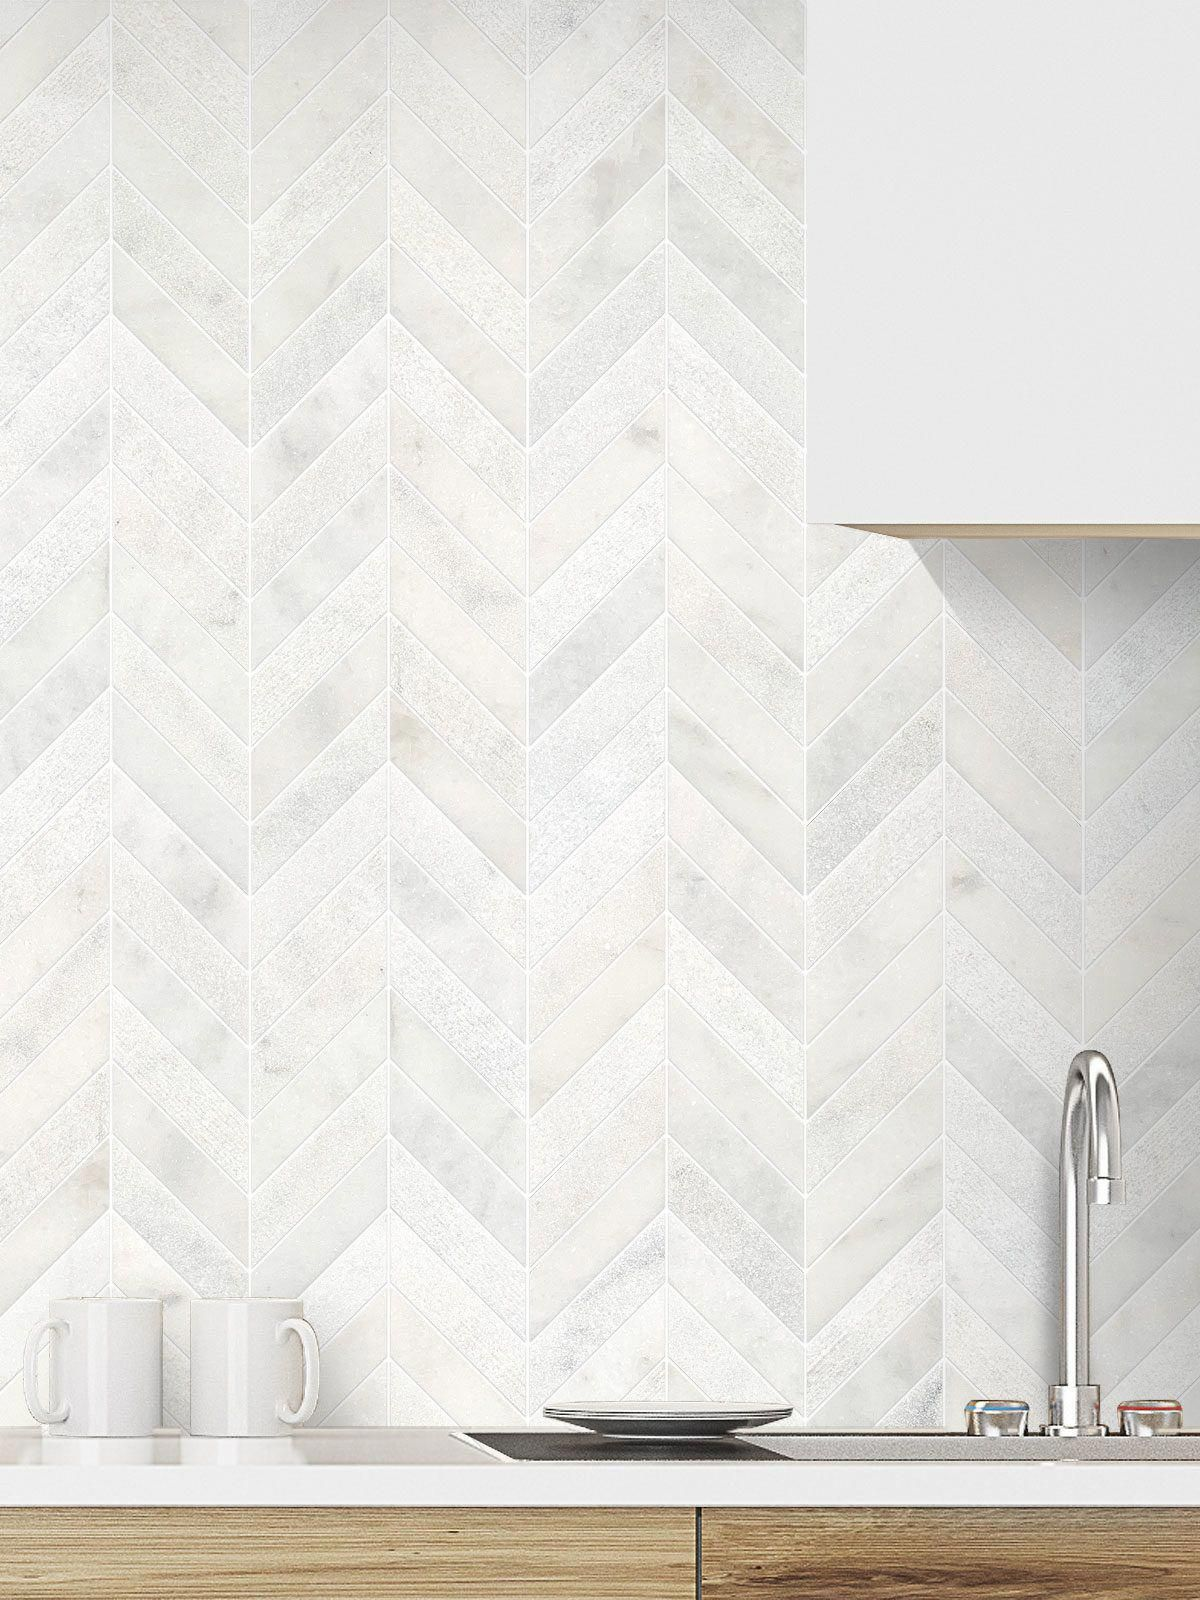 White Modern Marble Chevron Backsplash Tile Backsplash Com